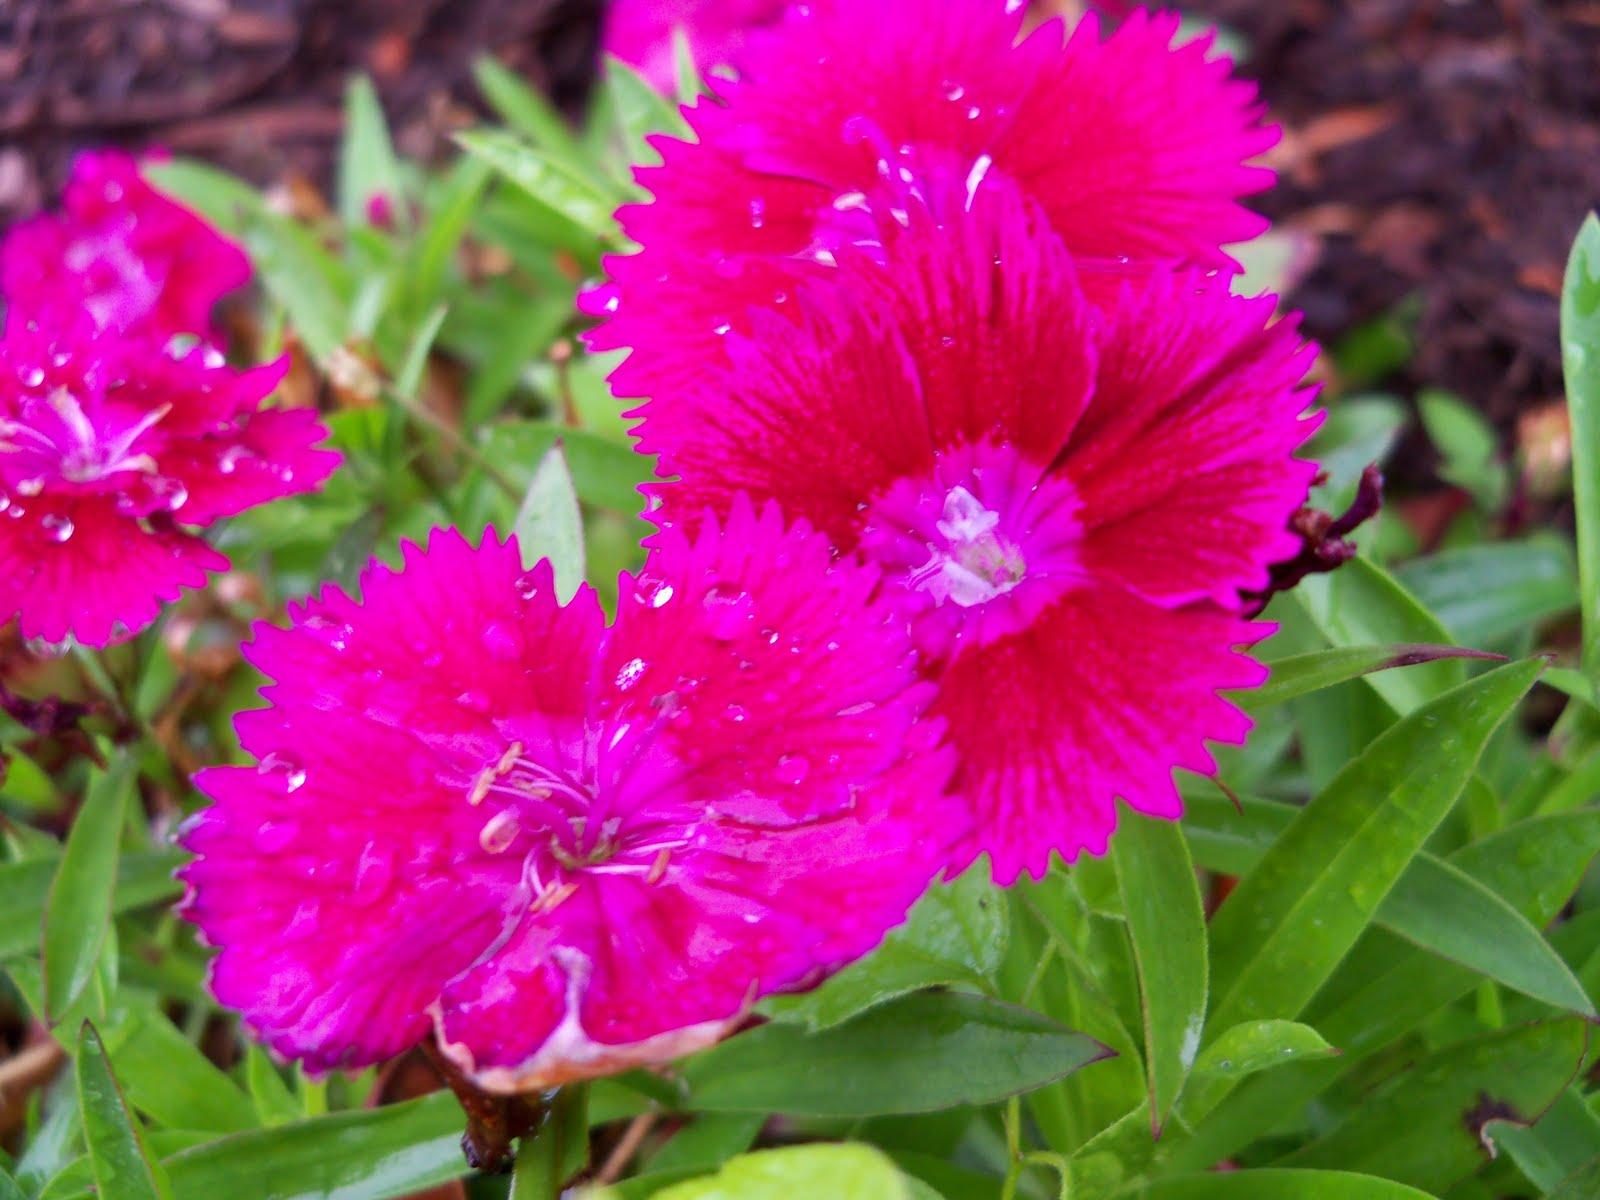 Gardening 2010 - 101_0548.JPG